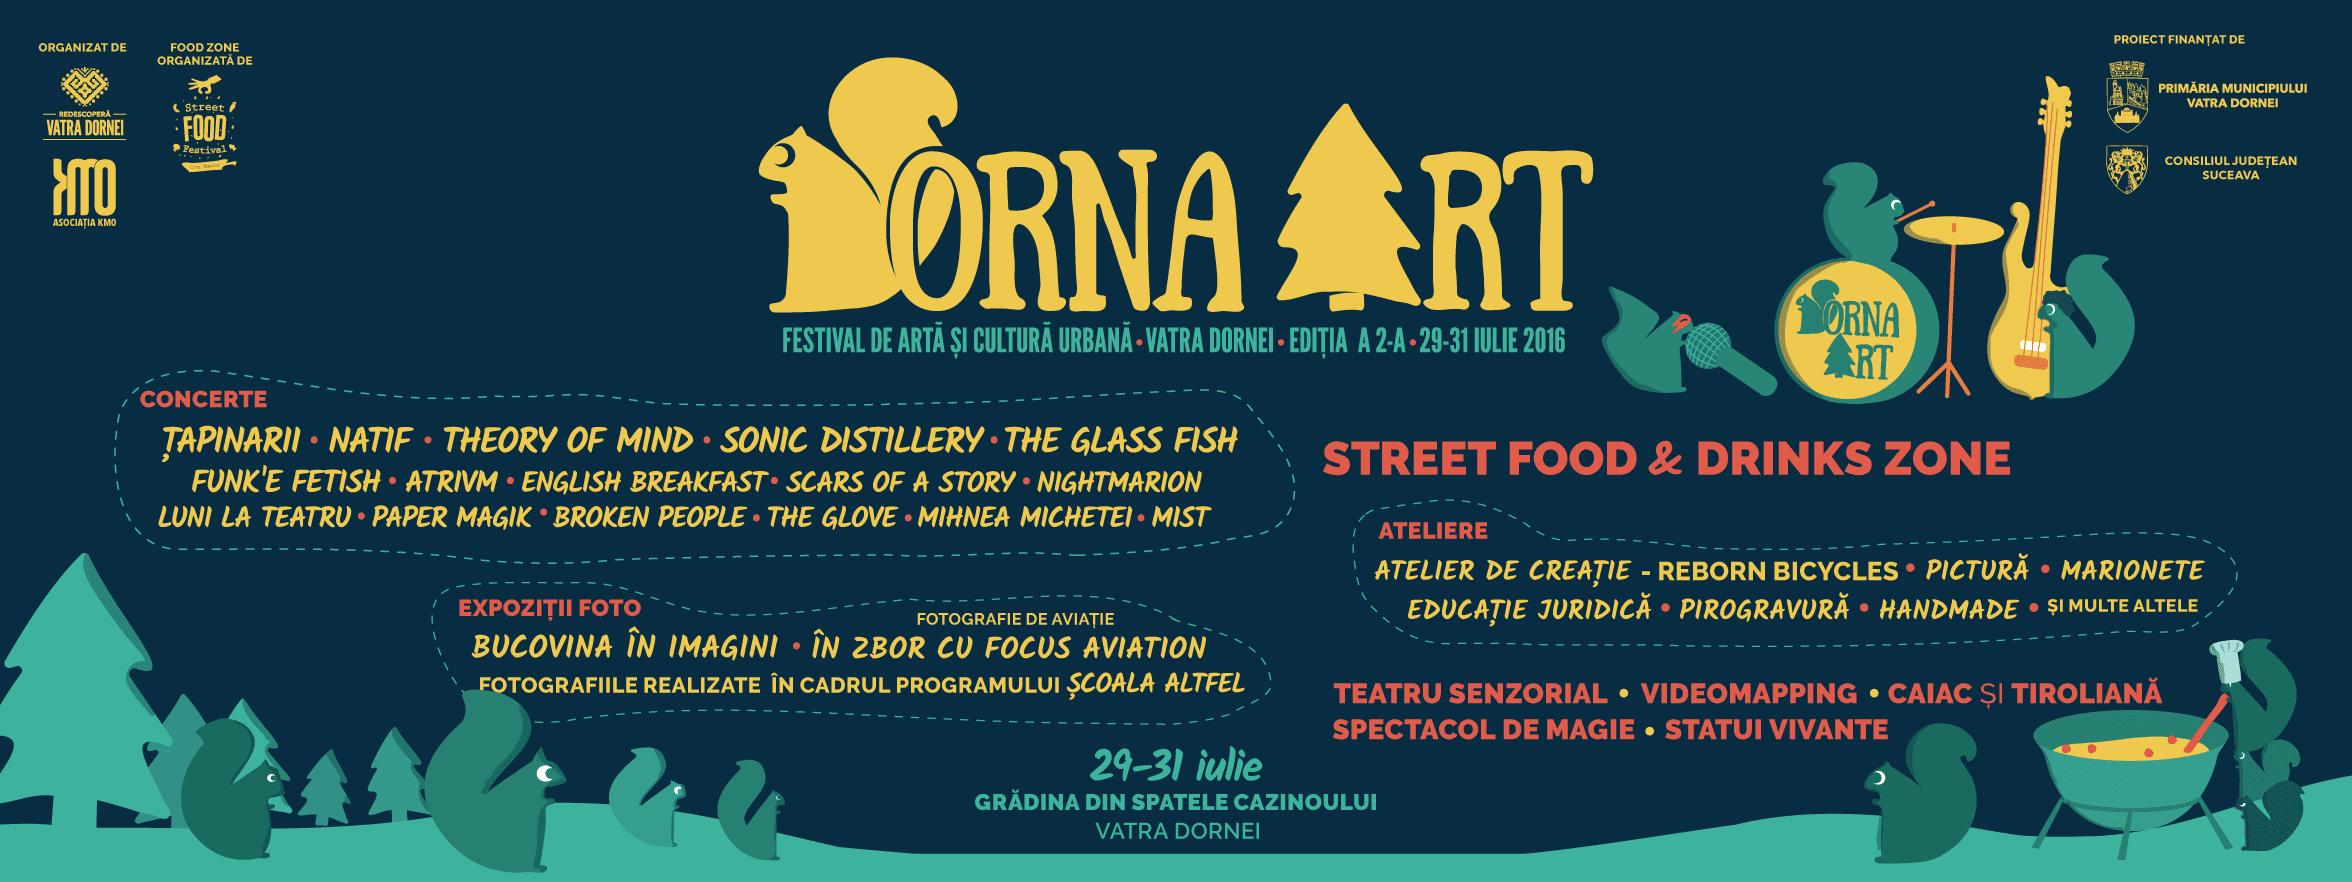 Dorna Art @ Vatra Dornei